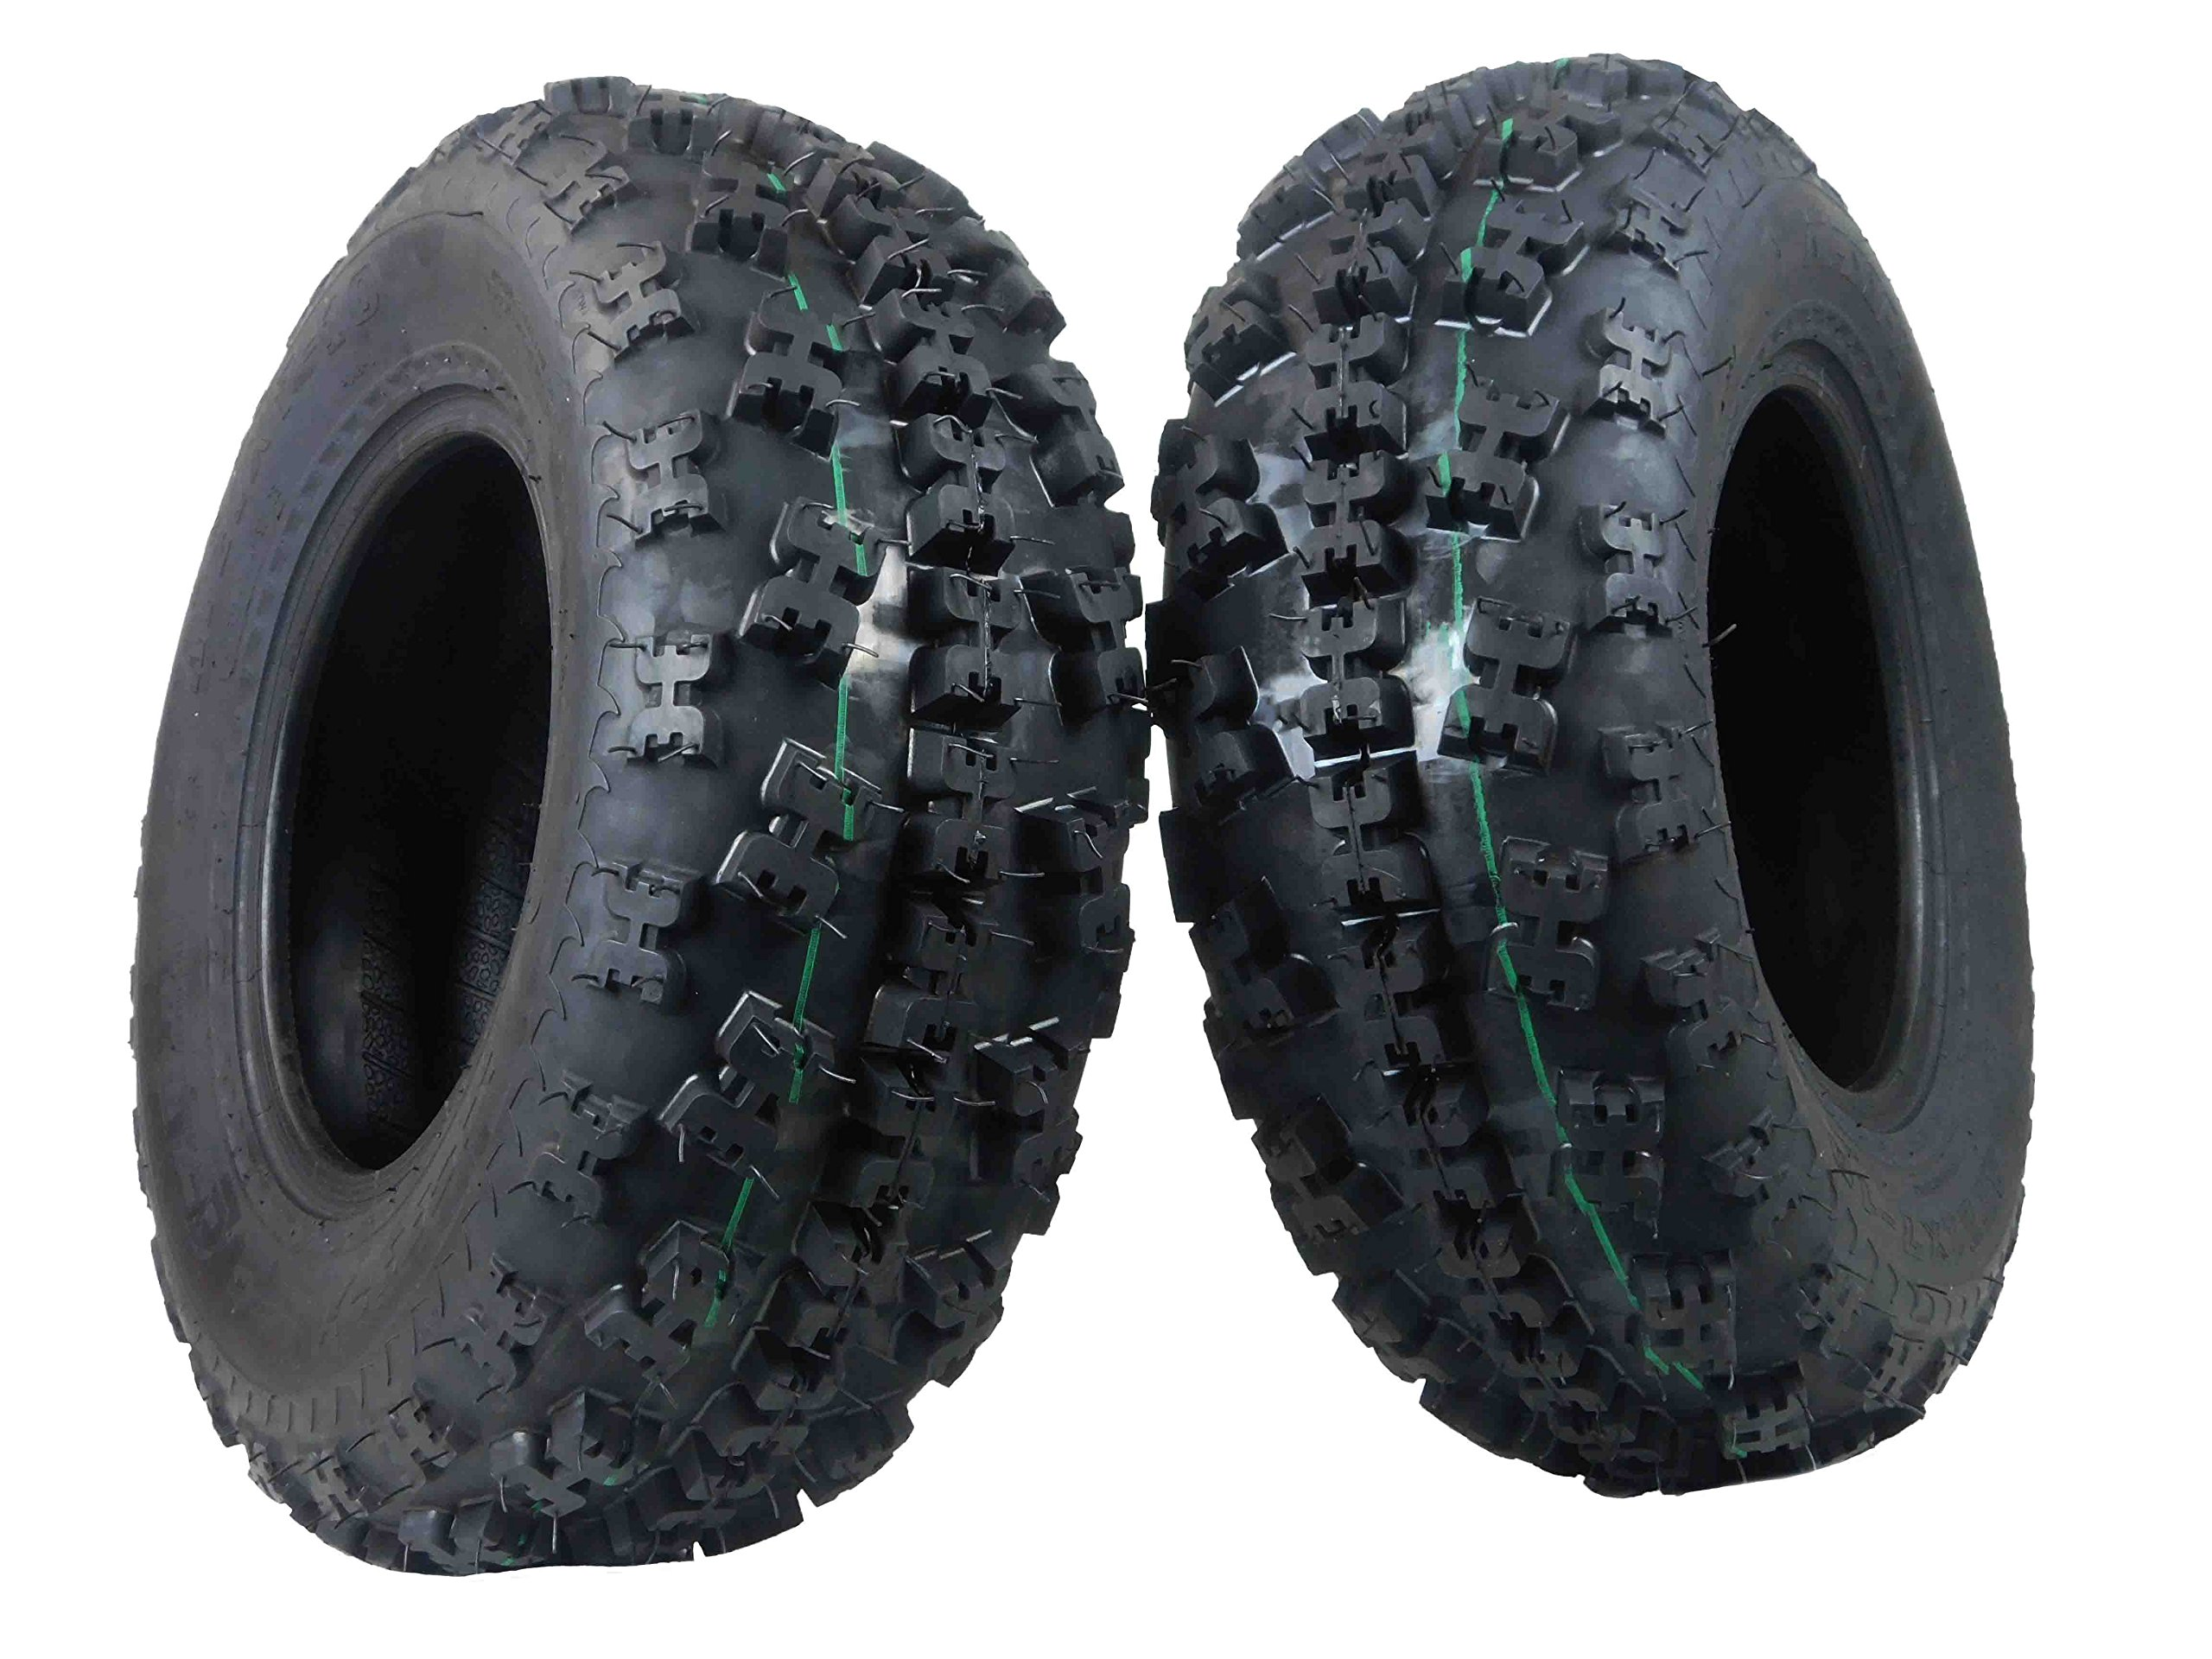 MASSFX Front Tire Set (2x) 4ply 21X7-10 ATV Tires 21 7 10 21x7x10 Pair